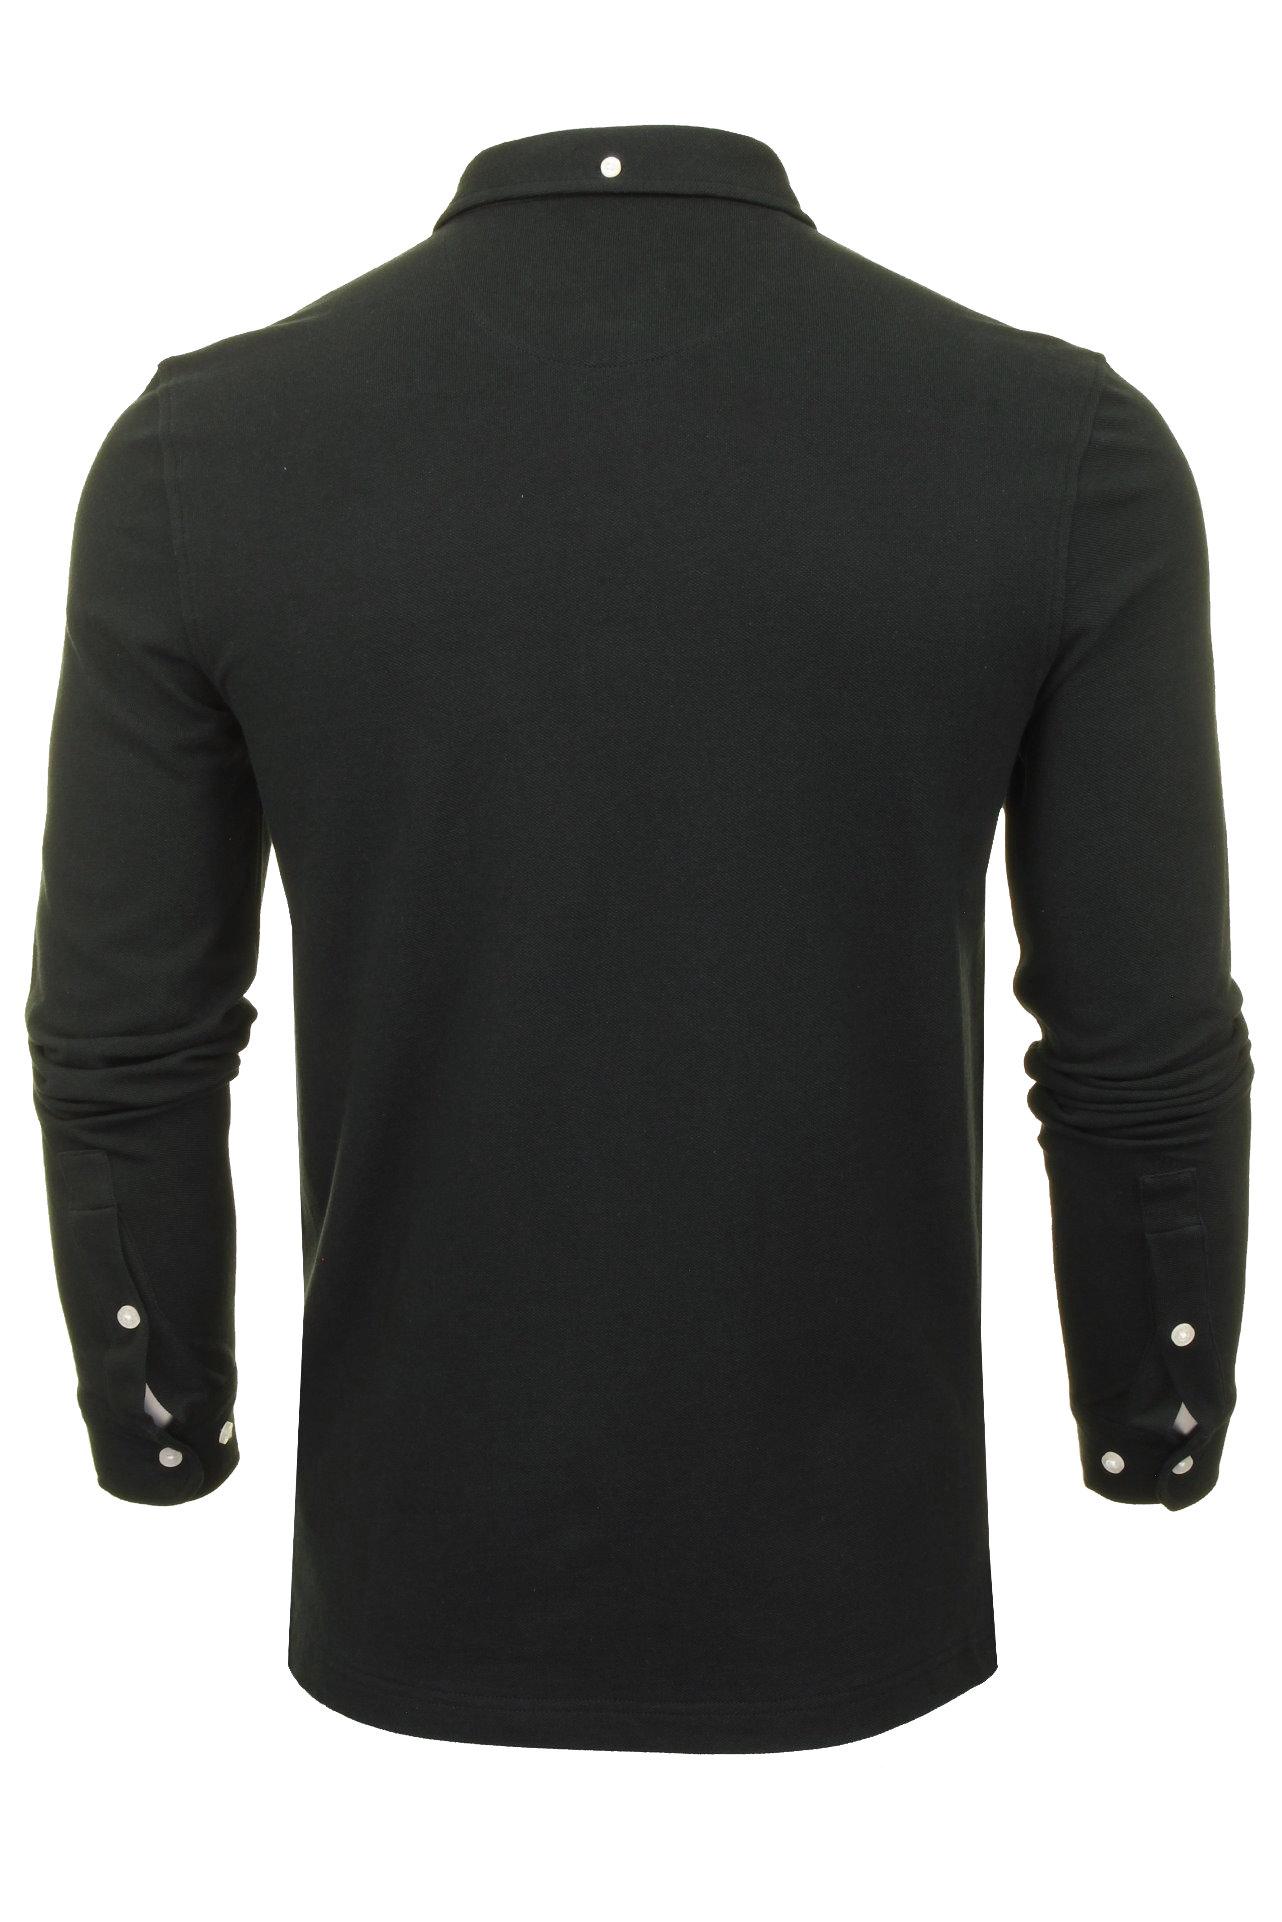 Farah-Mens-Polo-T-Shirt-039-Ricky-Polo-039-Long-Sleeved thumbnail 5